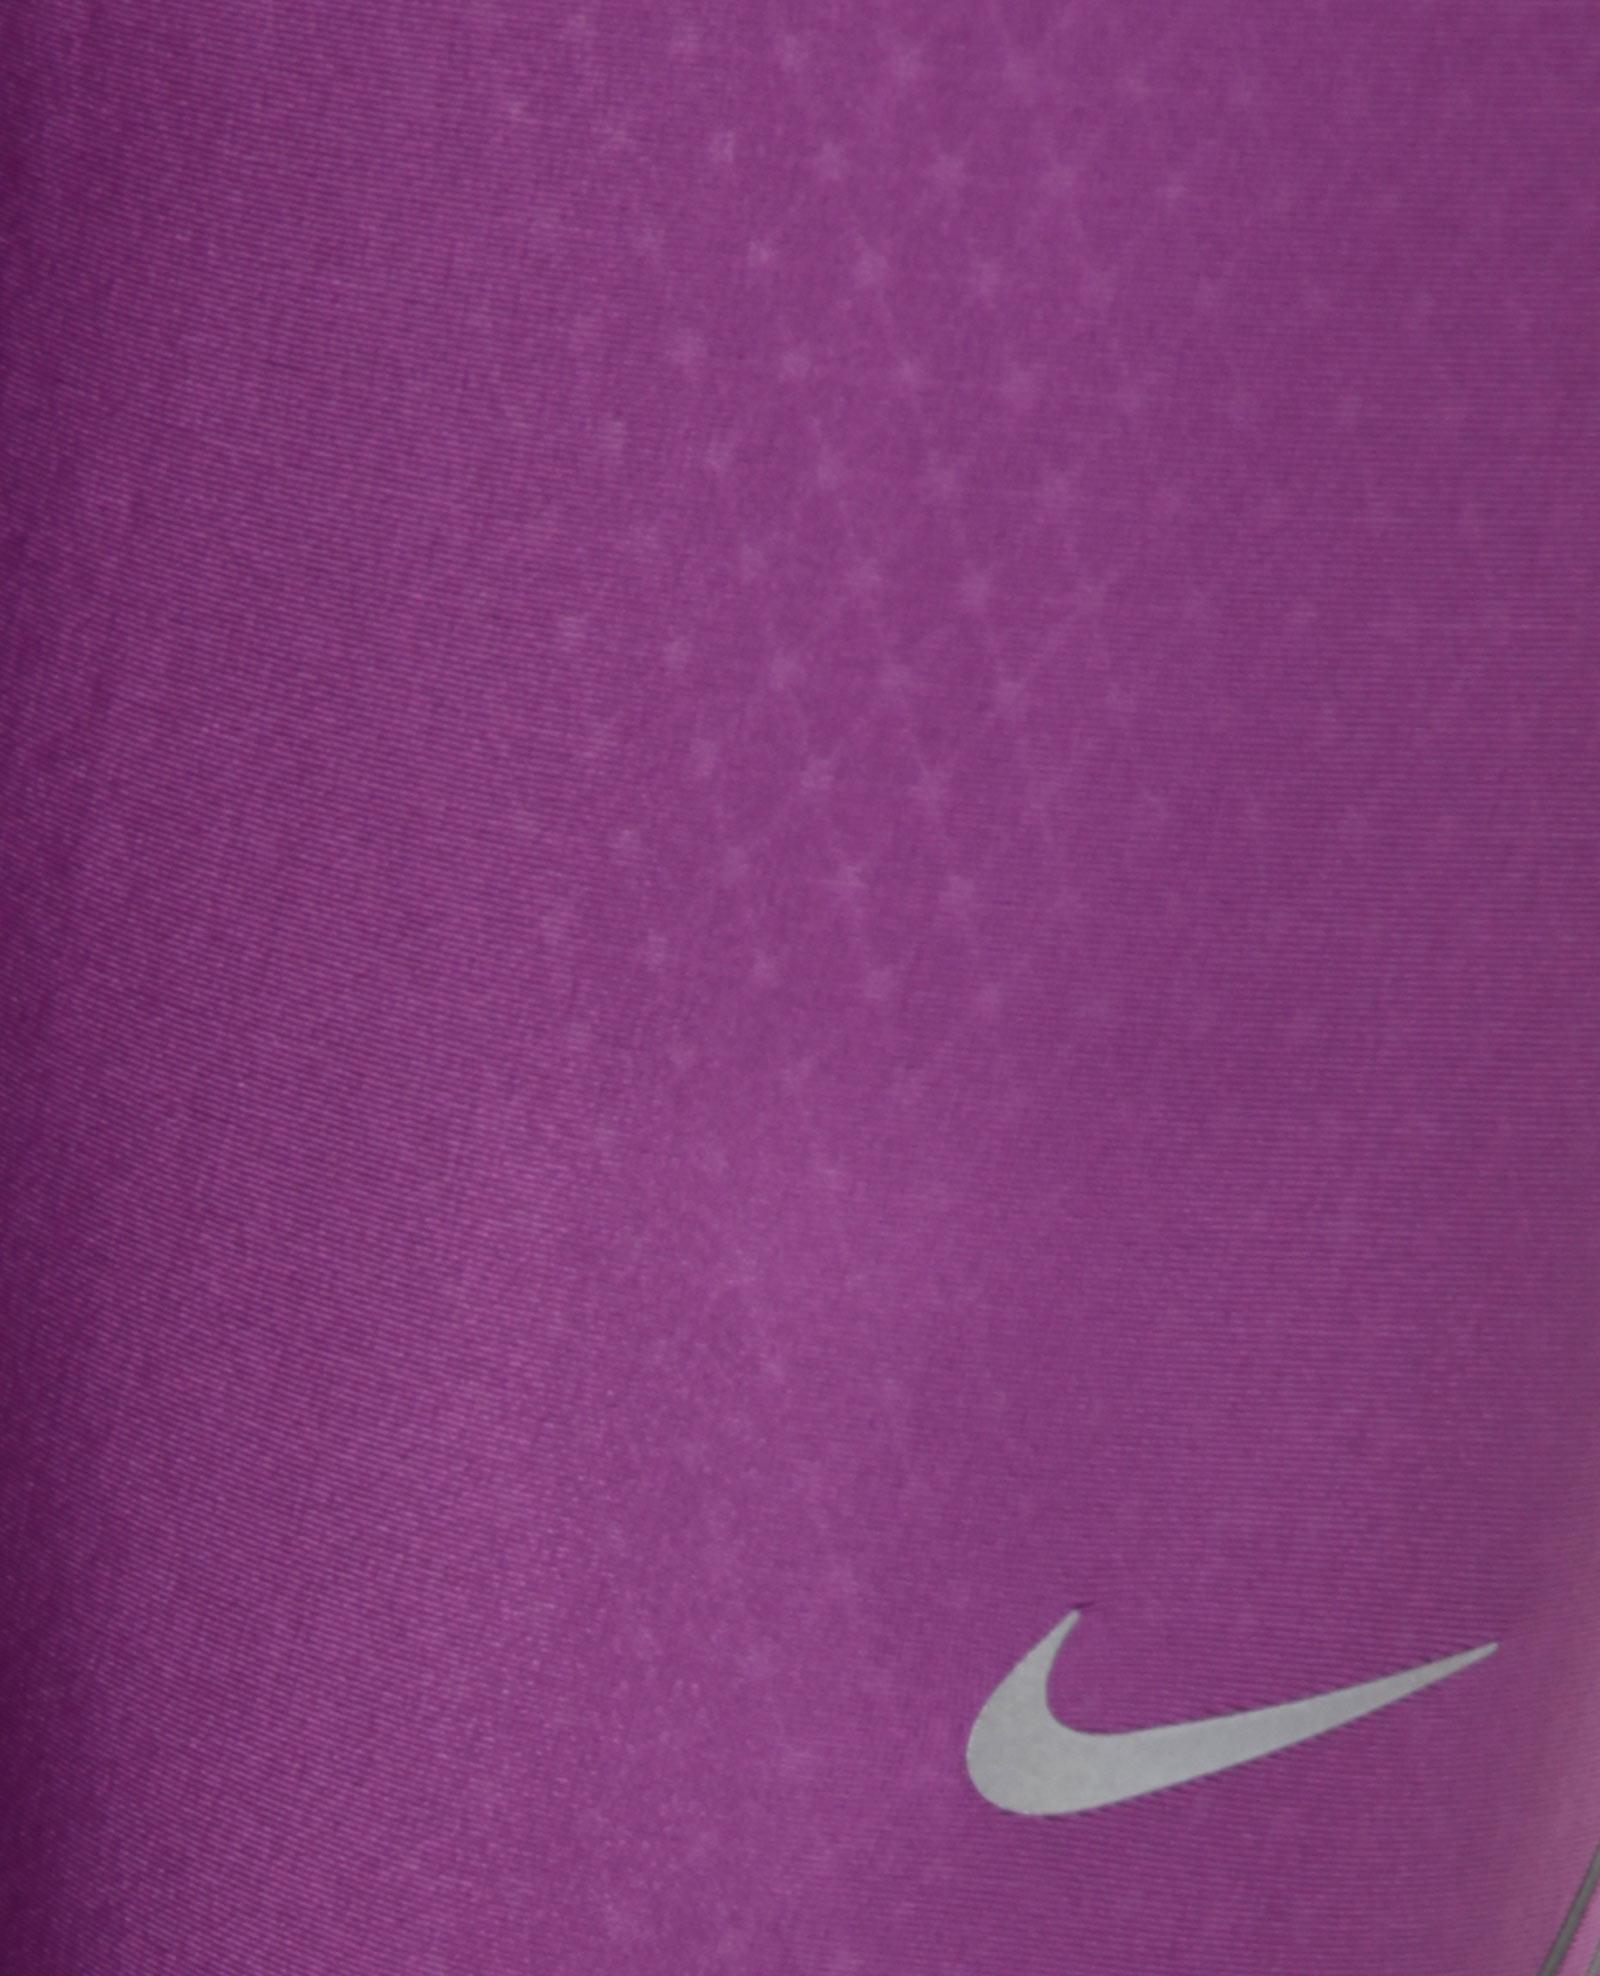 Nike-Potencia-Velocidad-Mujer-Dri-FIT-Correr-Piratas-largos-TODAS-LAS-TALLAS